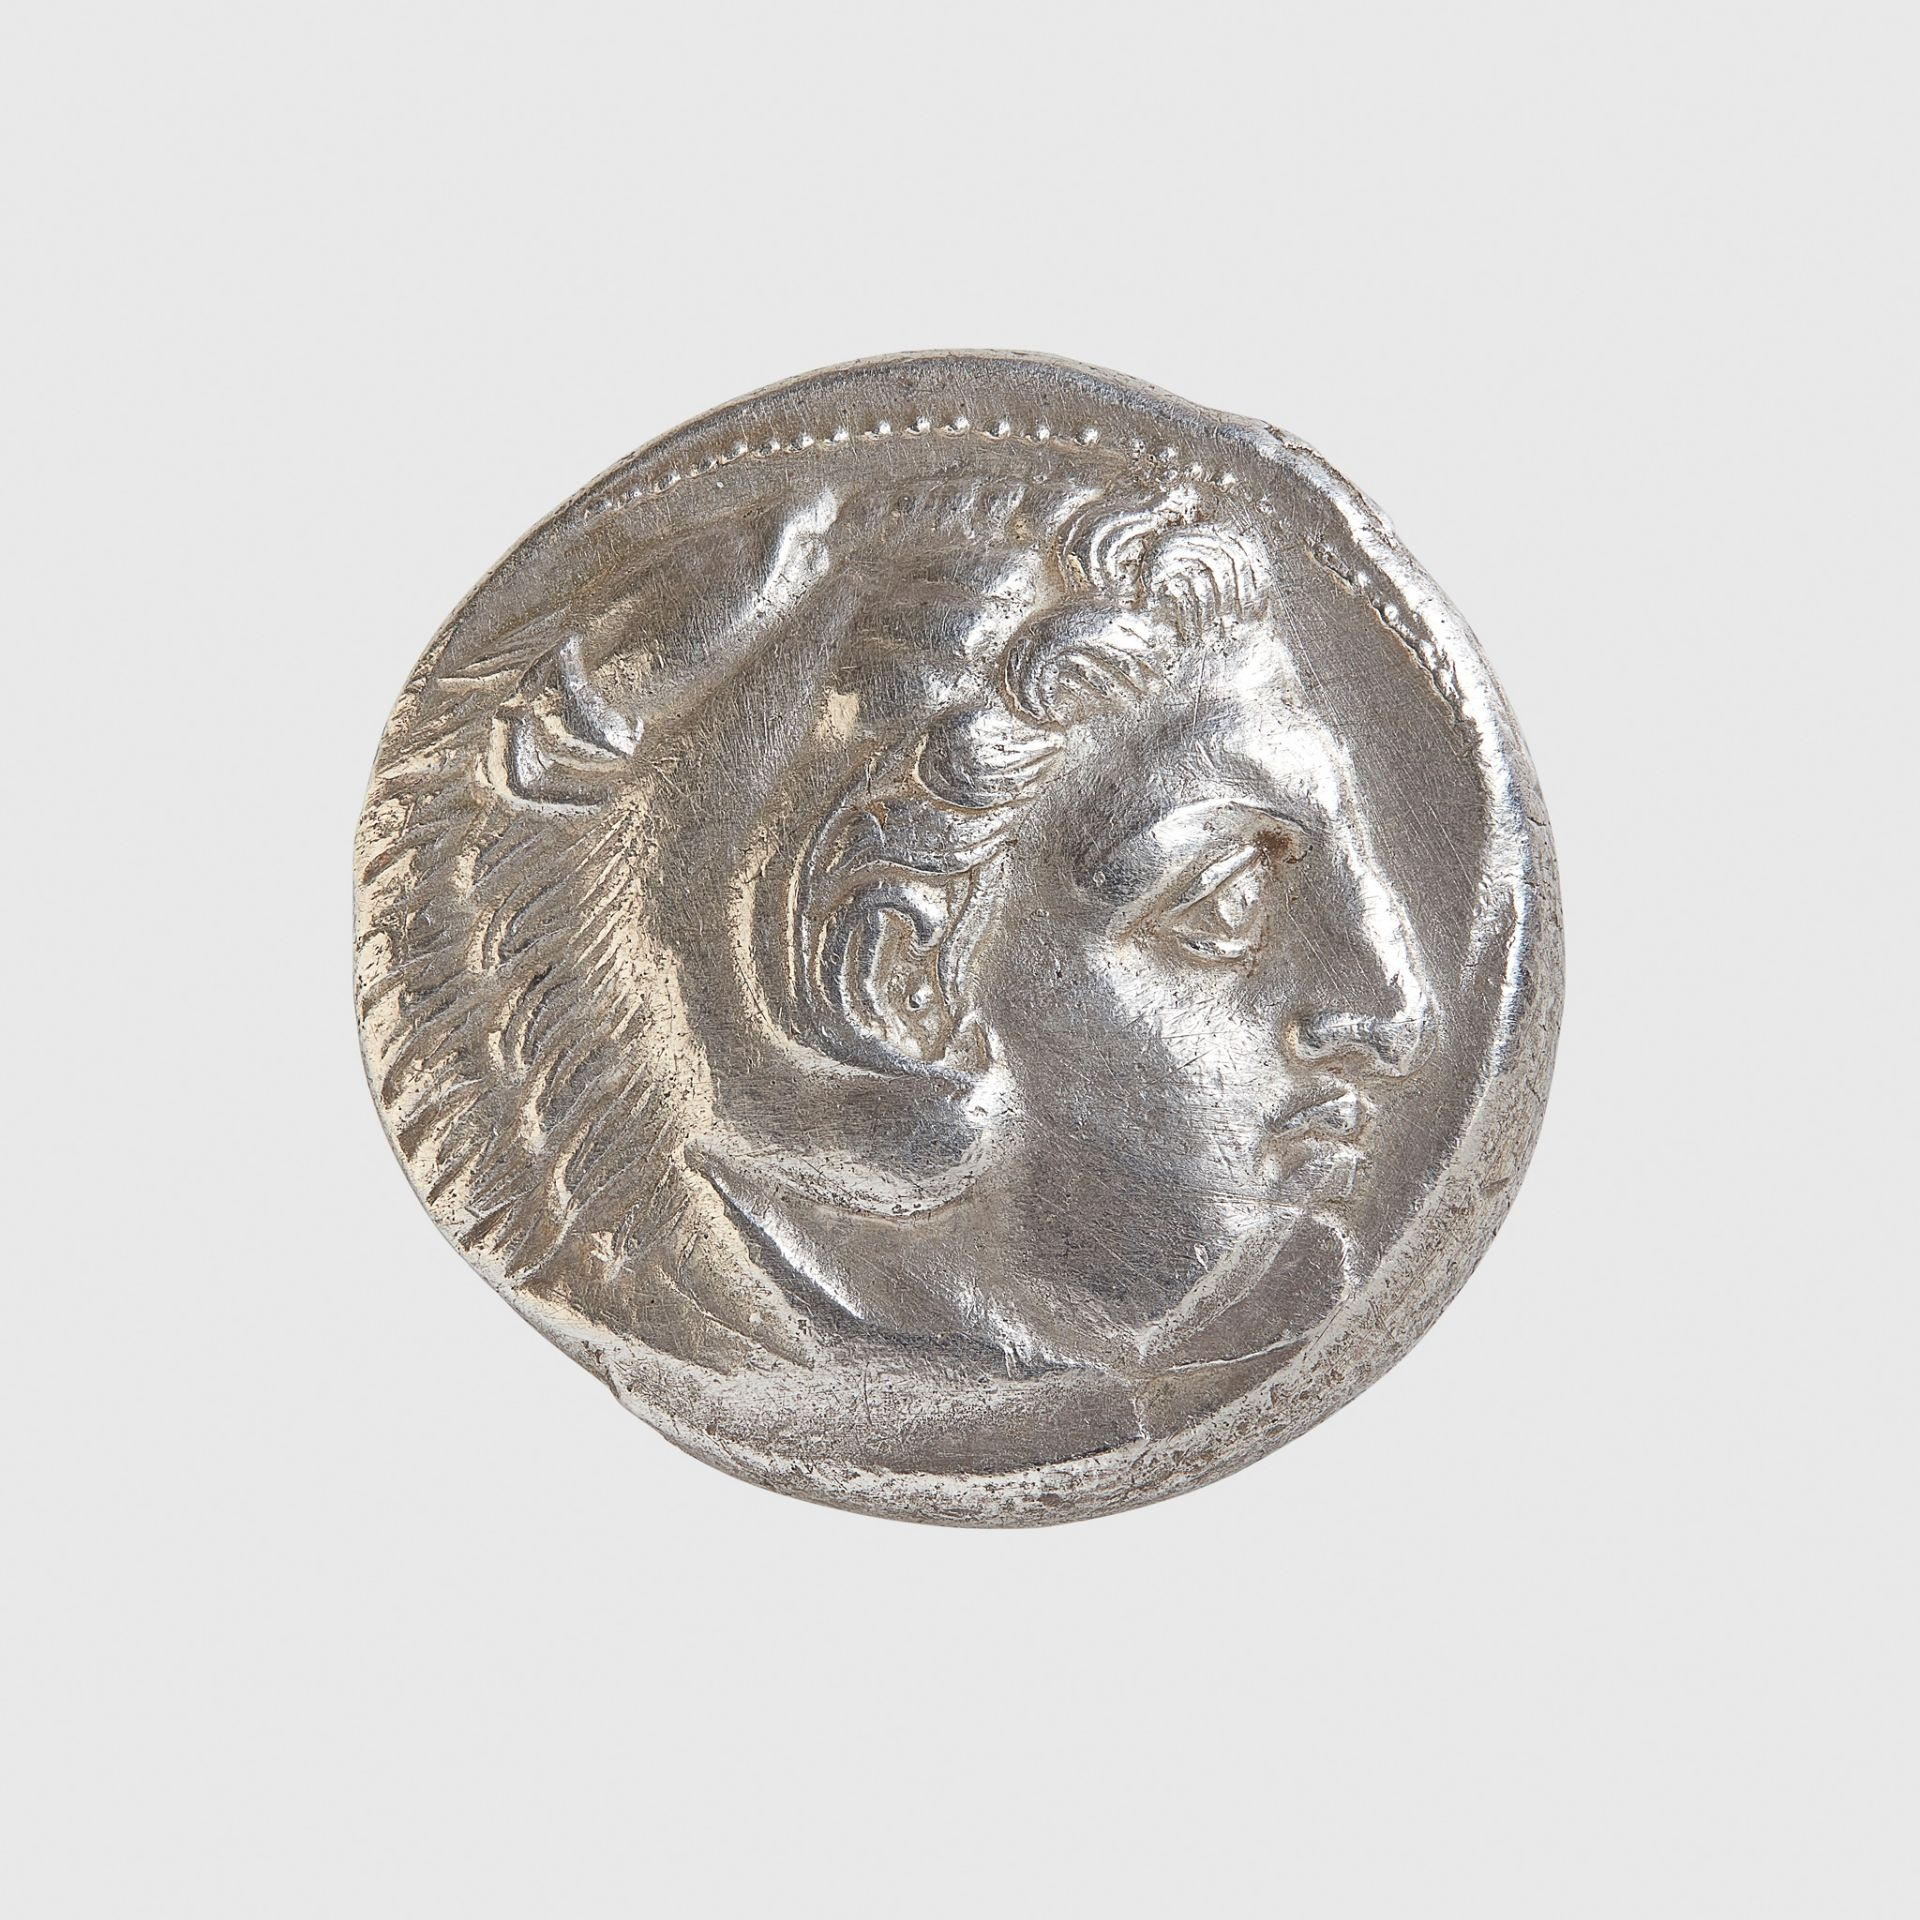 ALEXANDER THE GREAT SILVER TETRADRACHM GREECE, AMPHIPOLIS MINT, 325 - 323 B.C.